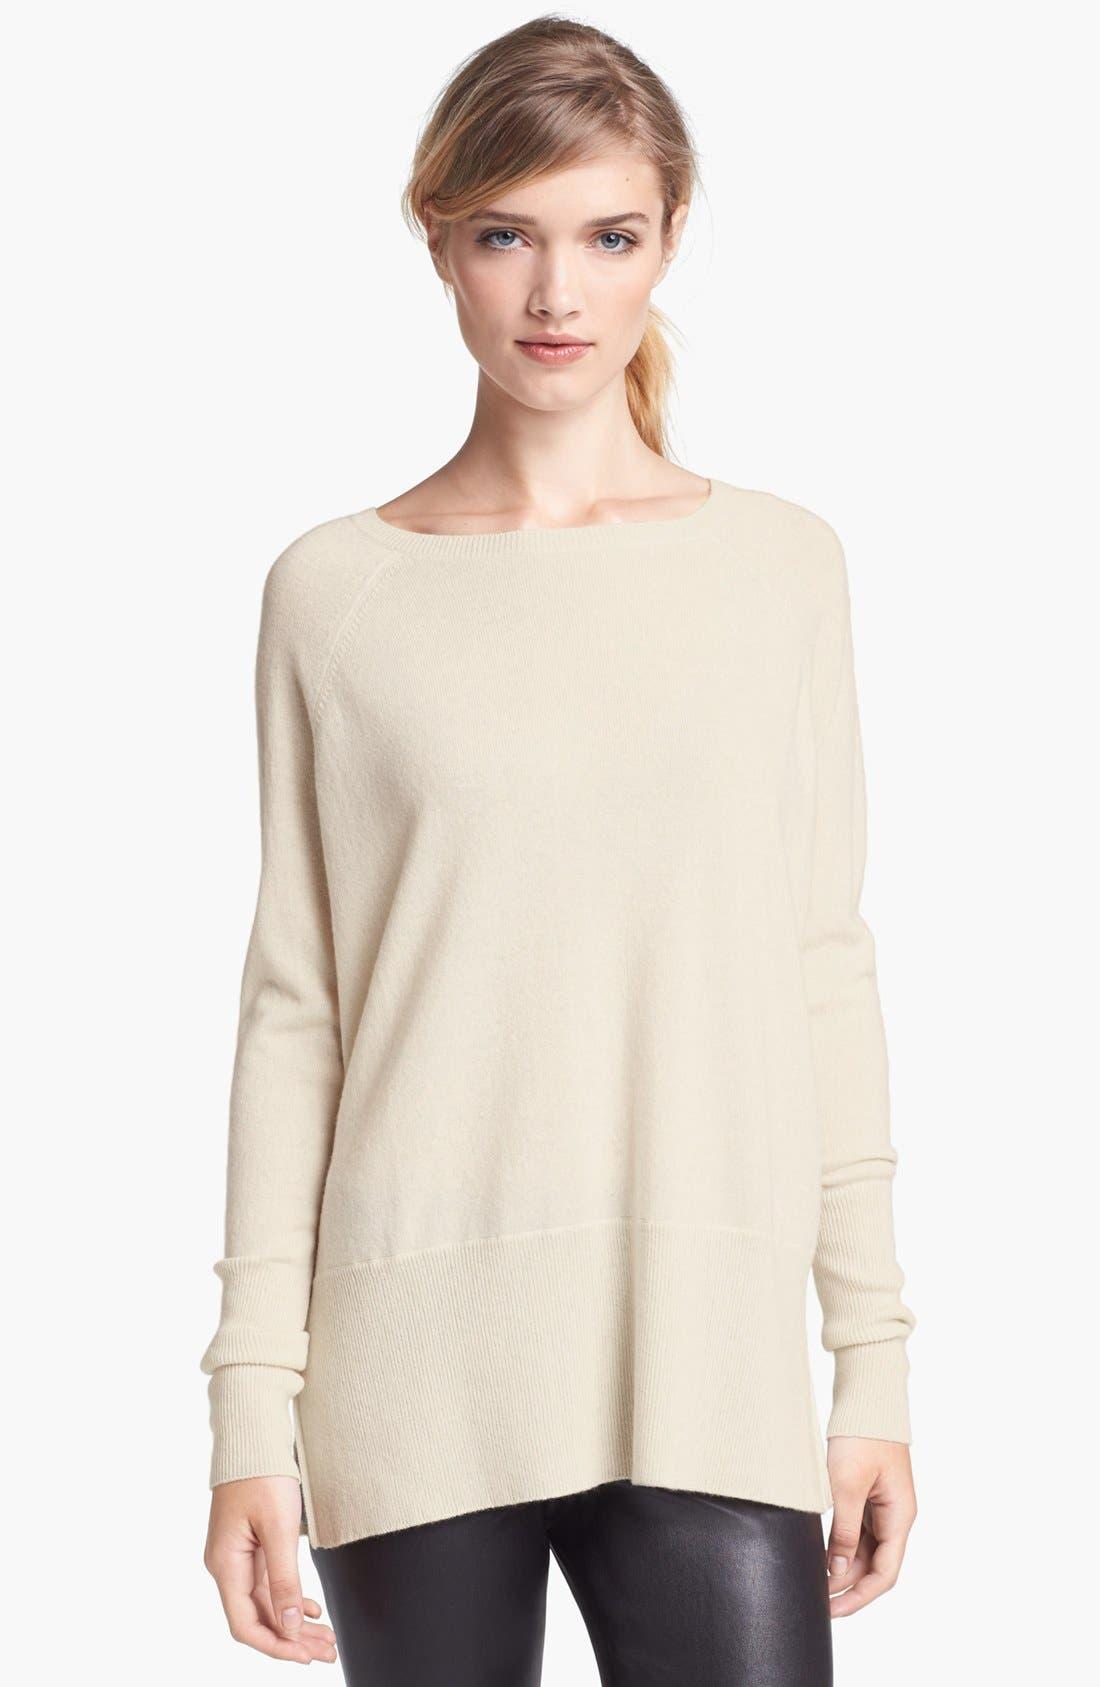 Alternate Image 1 Selected - Vince 'Square' Raglan Cashmere Sweater